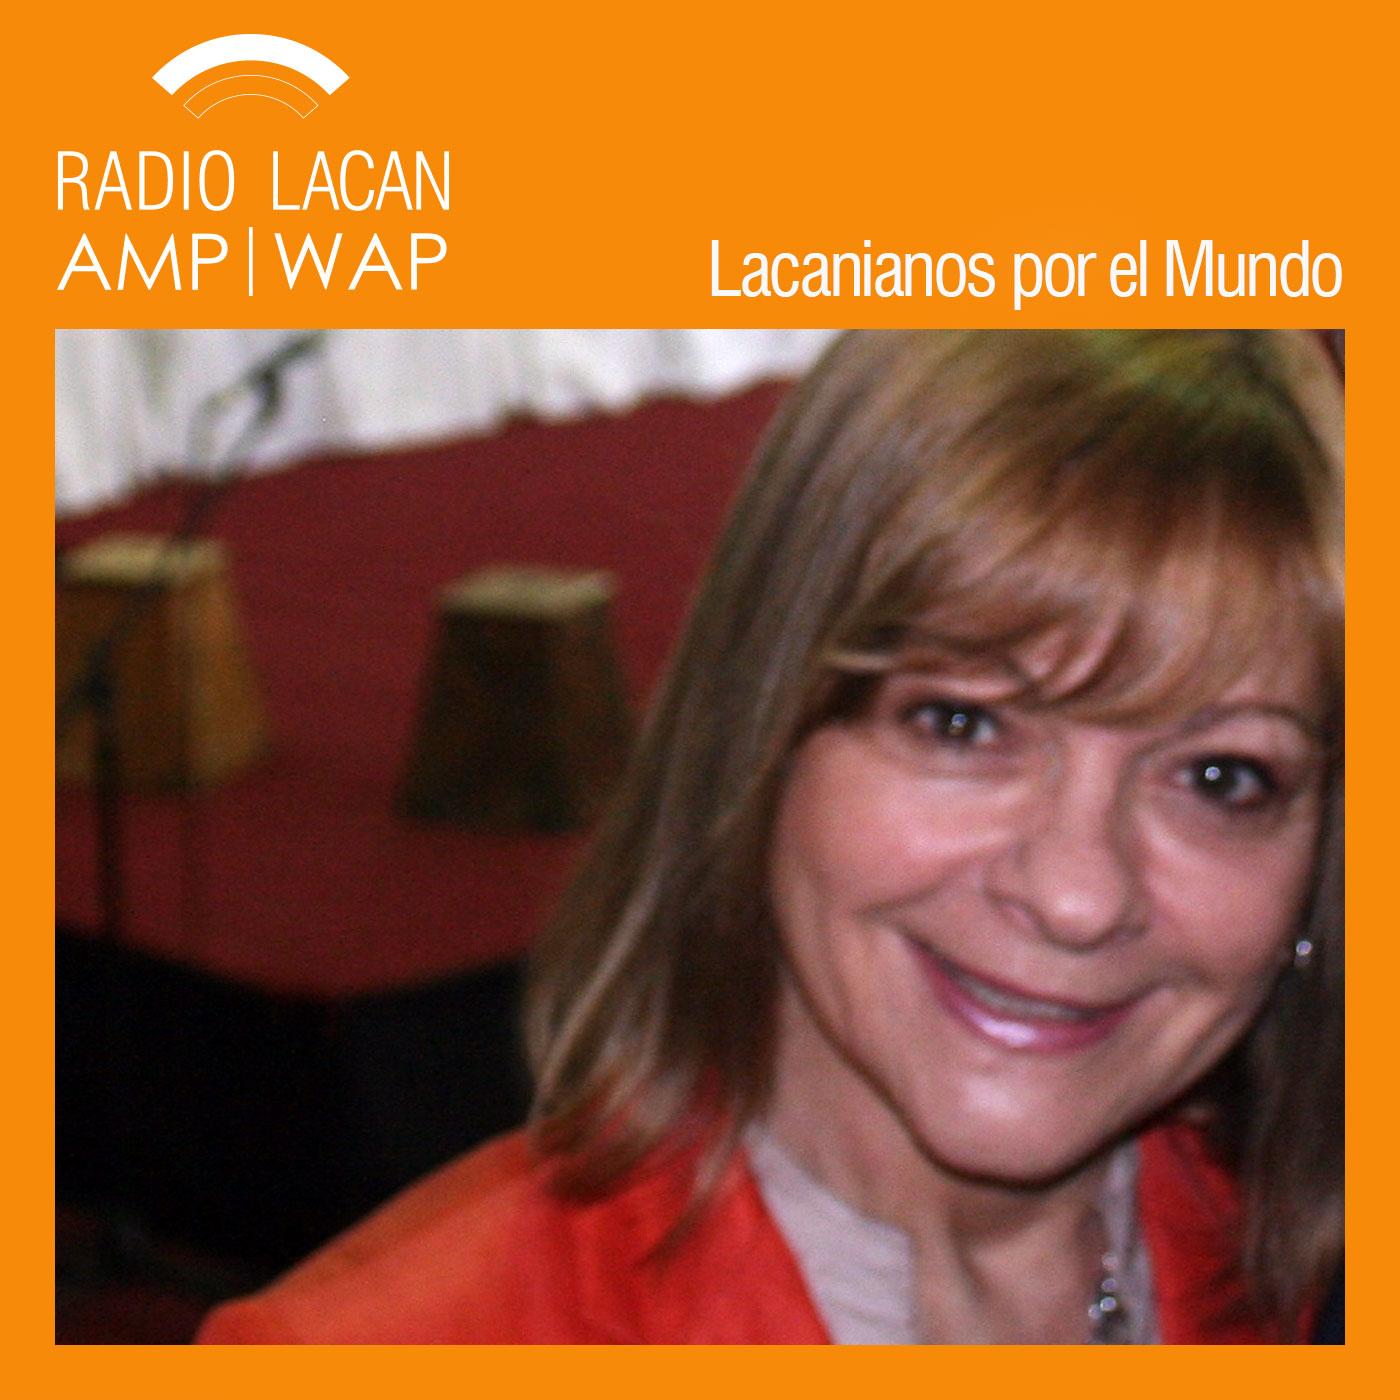 RadioLacan.com | <![CDATA[#LacanianosxElMundo: Guatemala. Entrevista a Susana Dicker]]>